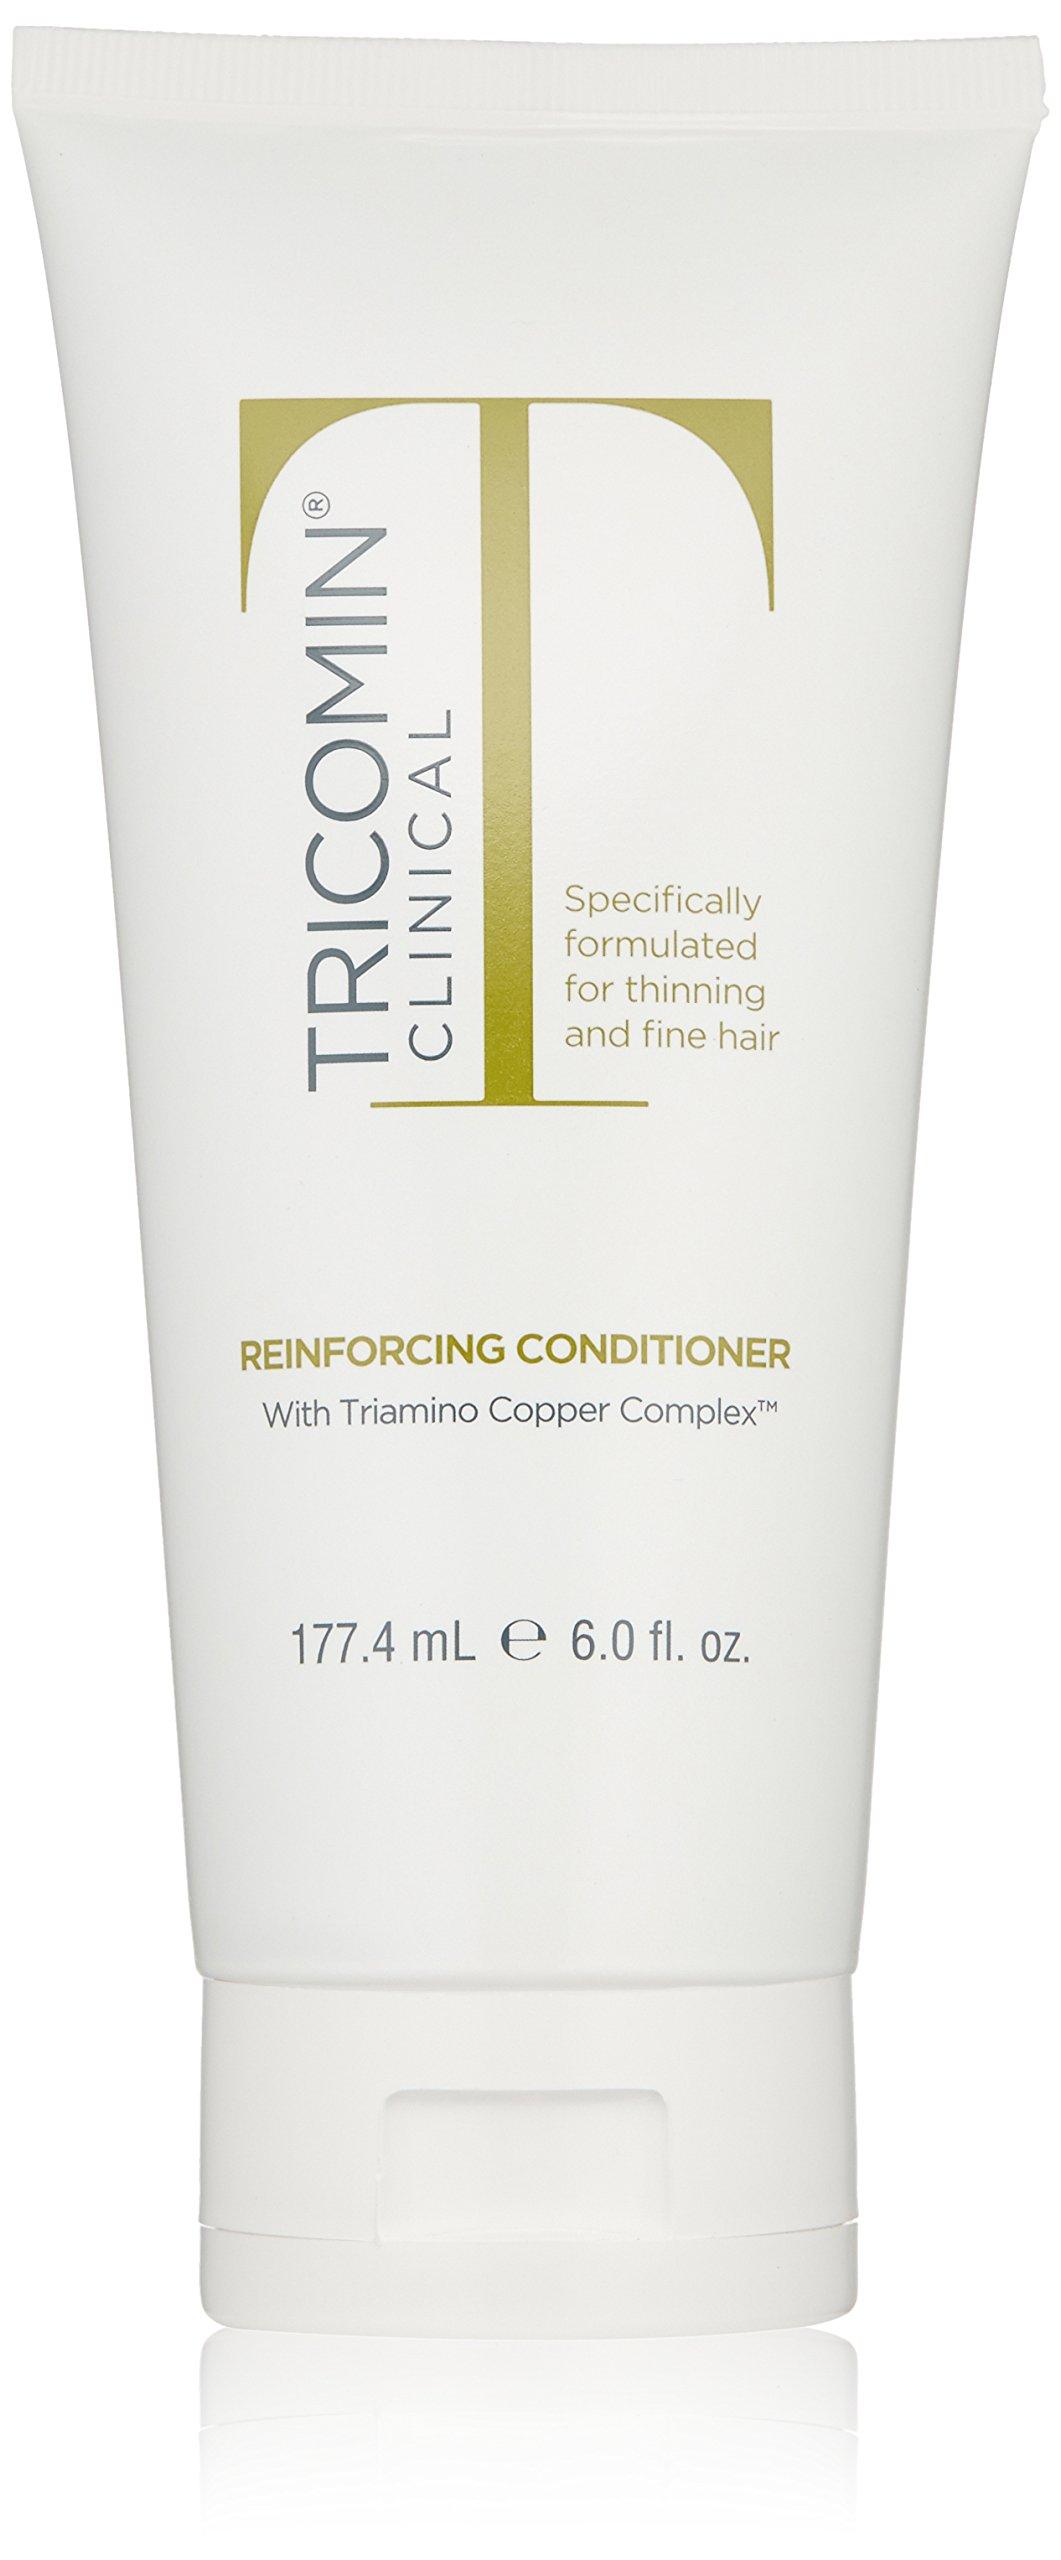 NEOVA Tricomin Reinforcing Conditioner, 6.0 Fl Oz